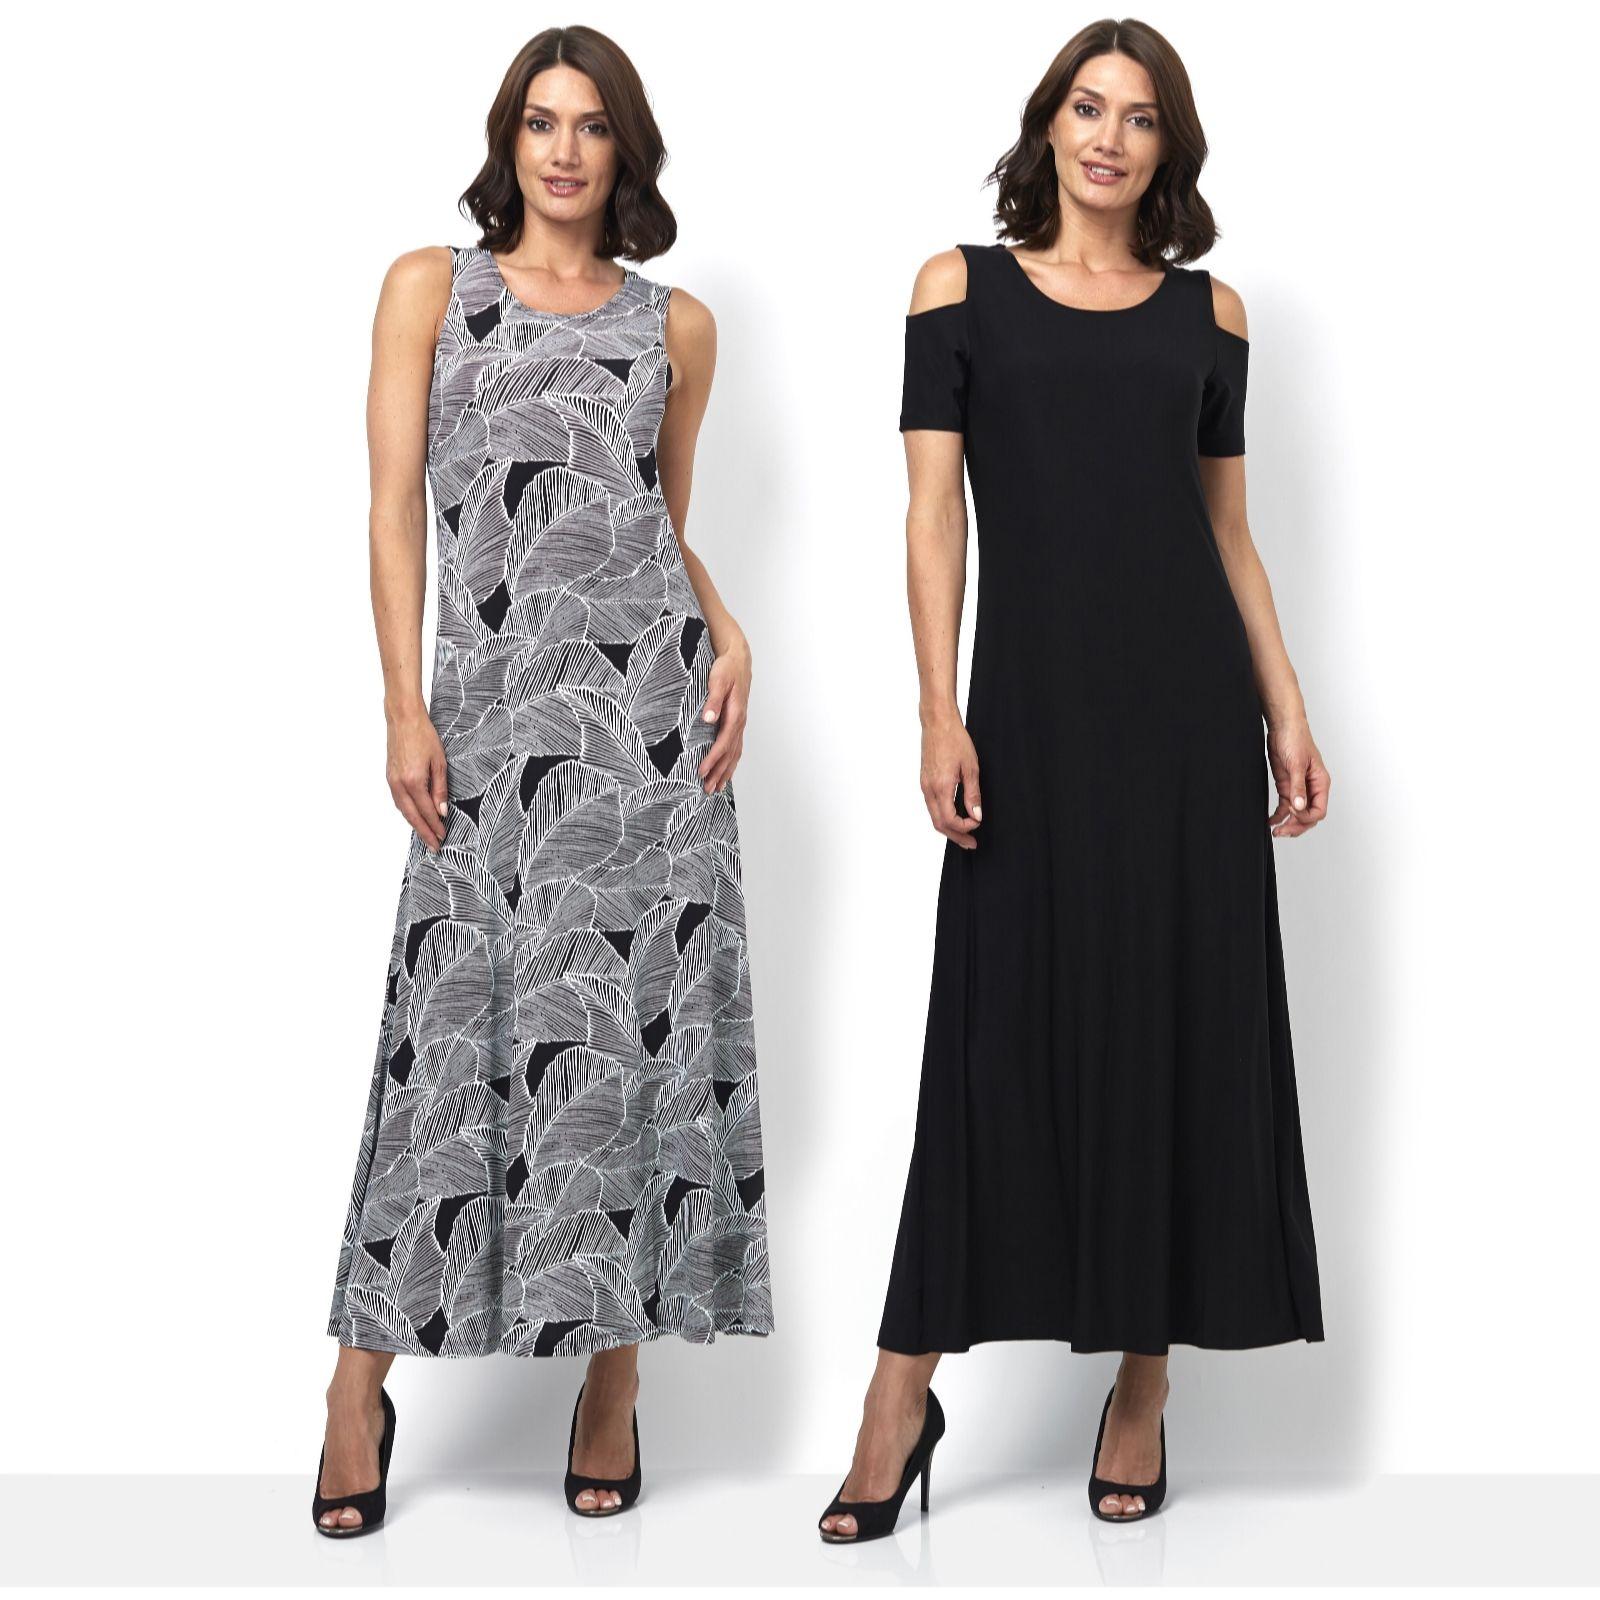 ab2f252970d Attitudes by Renee Print   Plain 2Pack Maxi Dress Petite Length - QVC UK